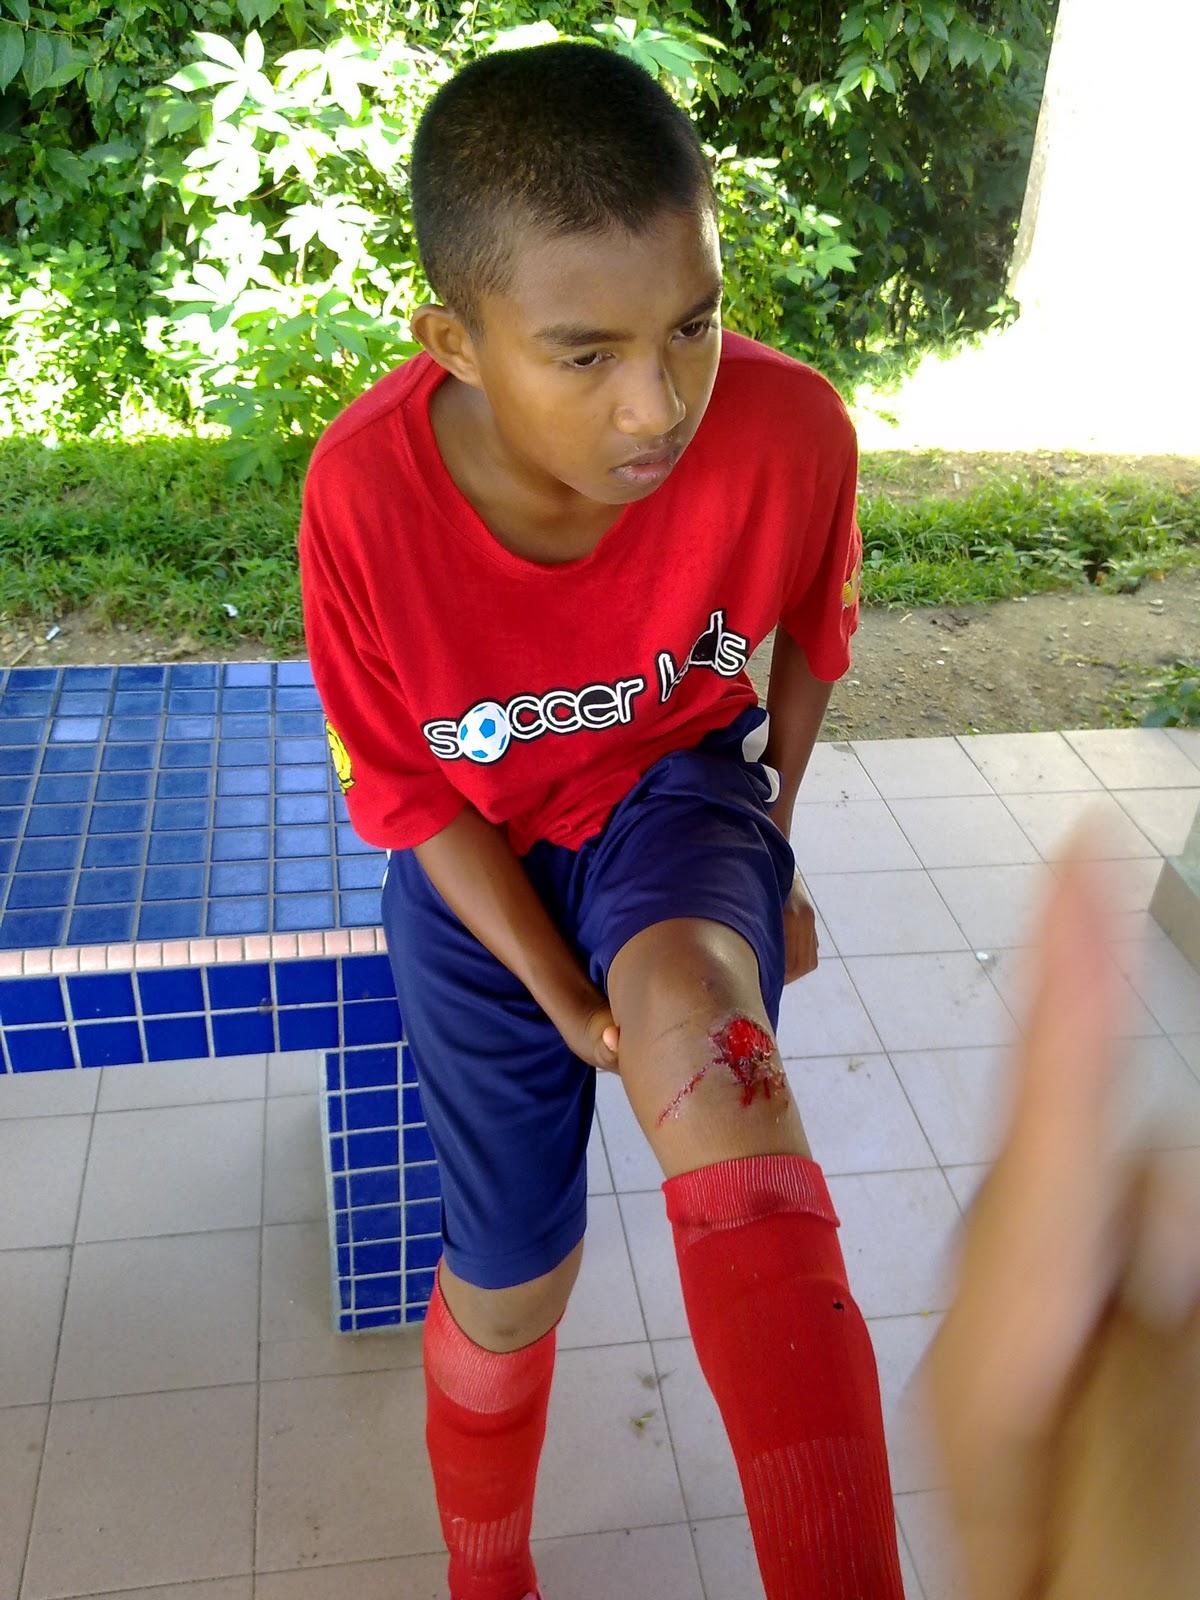 images of Syok Main Janda Soccerkidstv3 2011 01 Archive